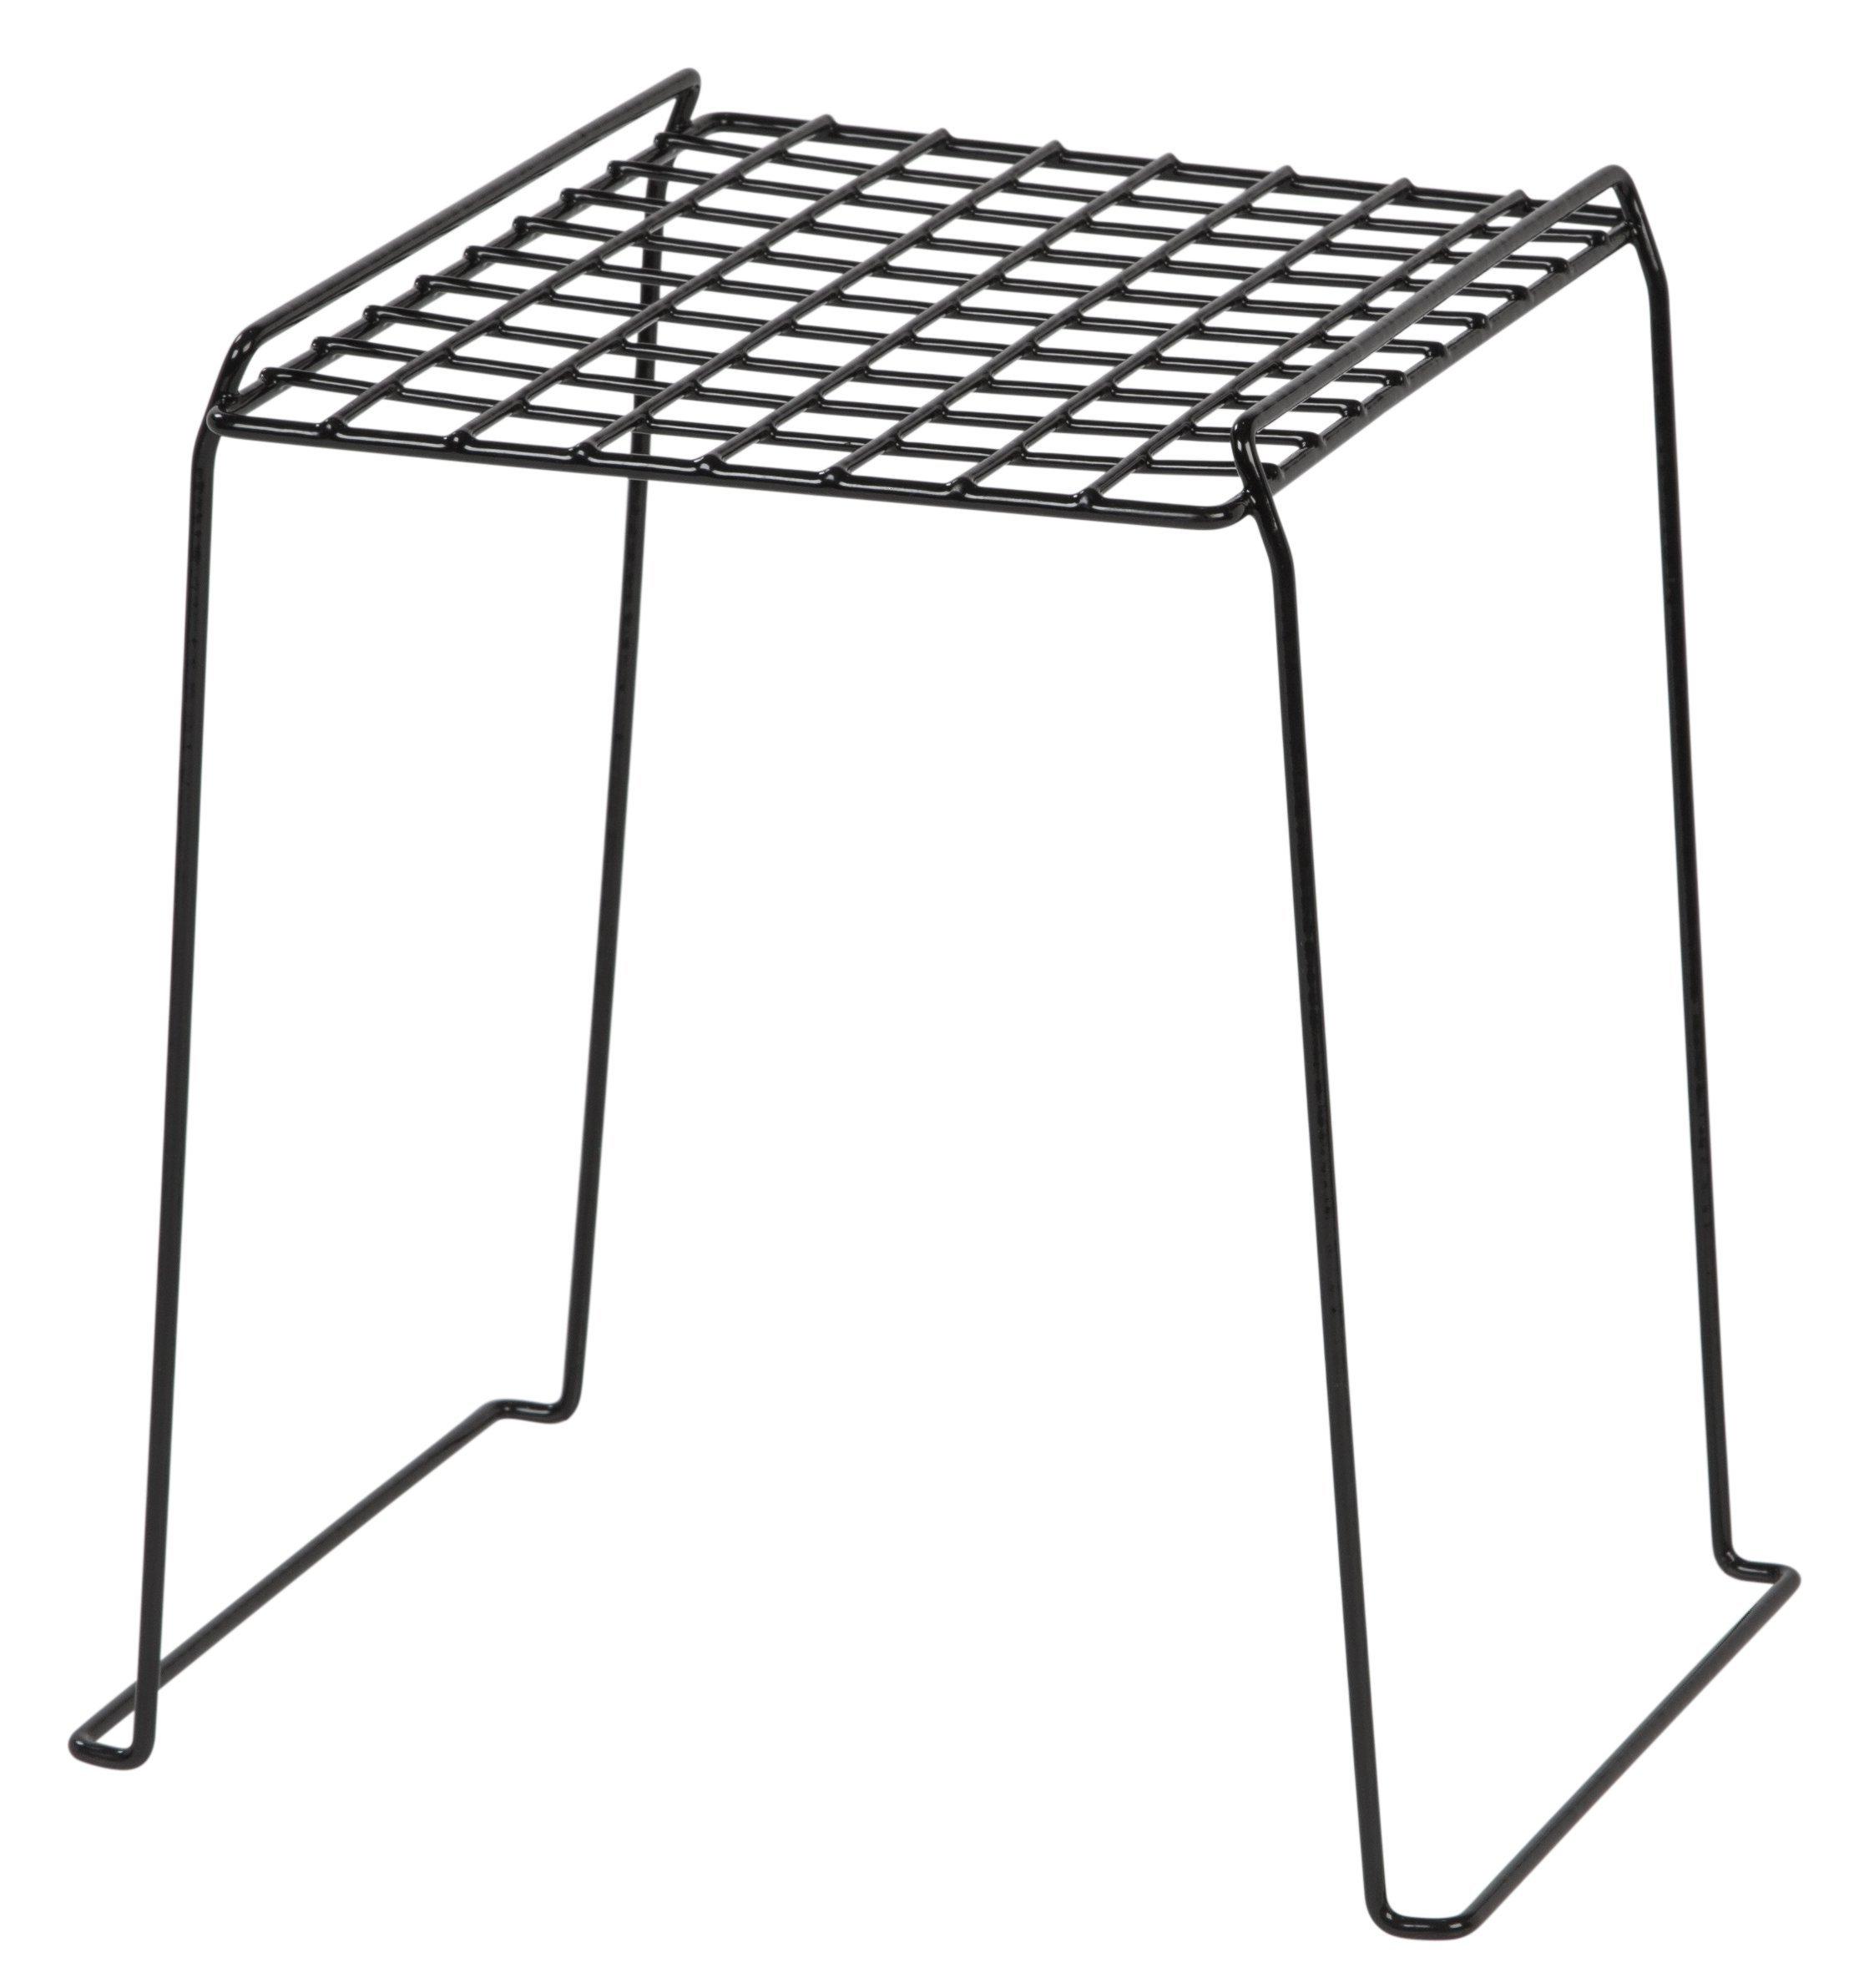 IRIS 12-inch Stackable Wire Locker Shelf, 4-pack, Black